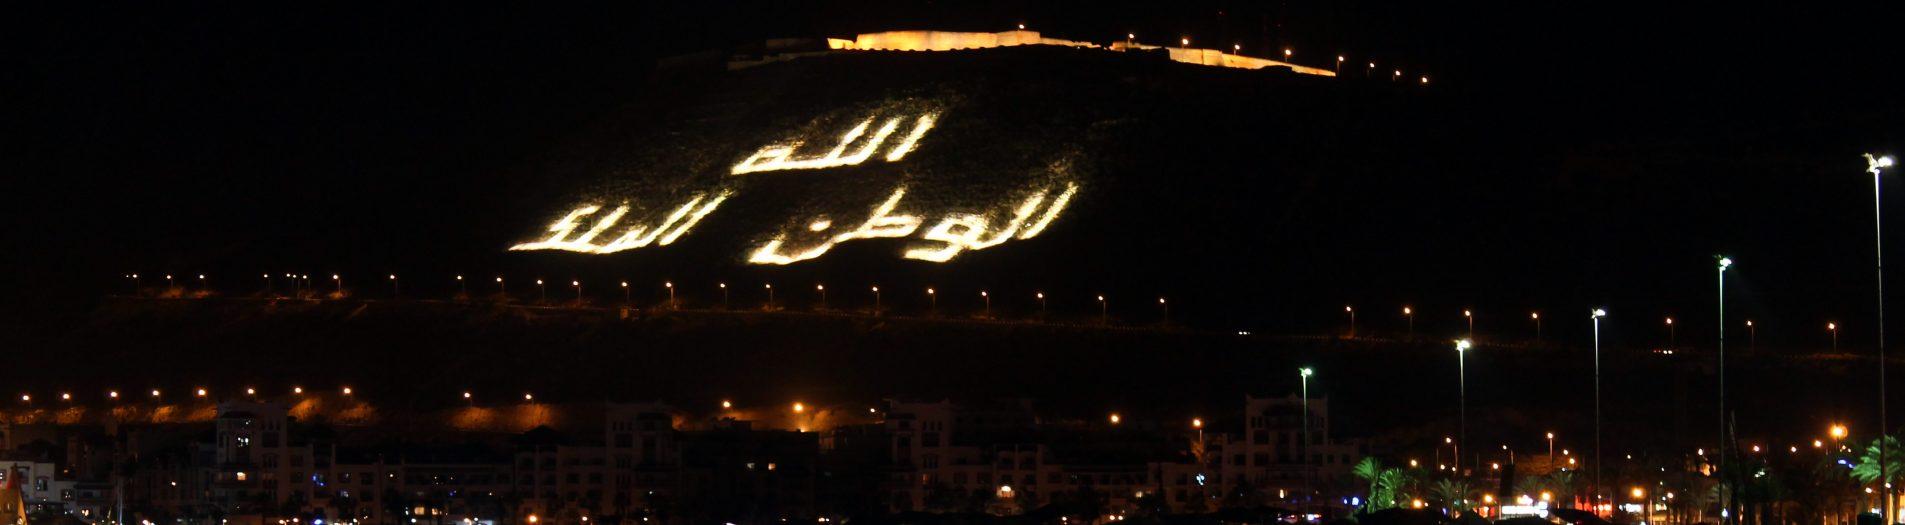 Agadir (Maroc) أغادير